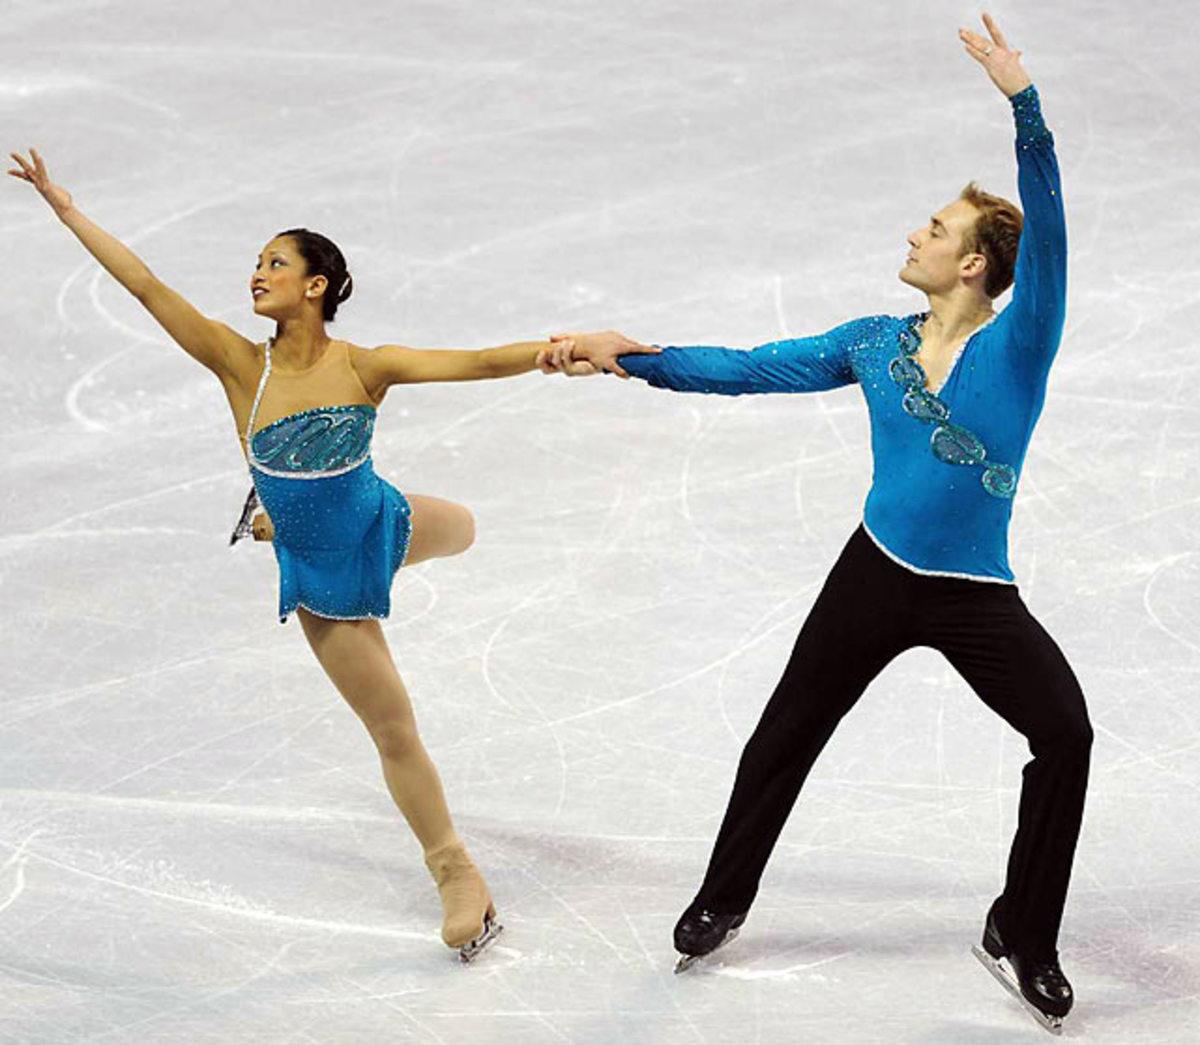 Amanda Evora and Mark Ladwig